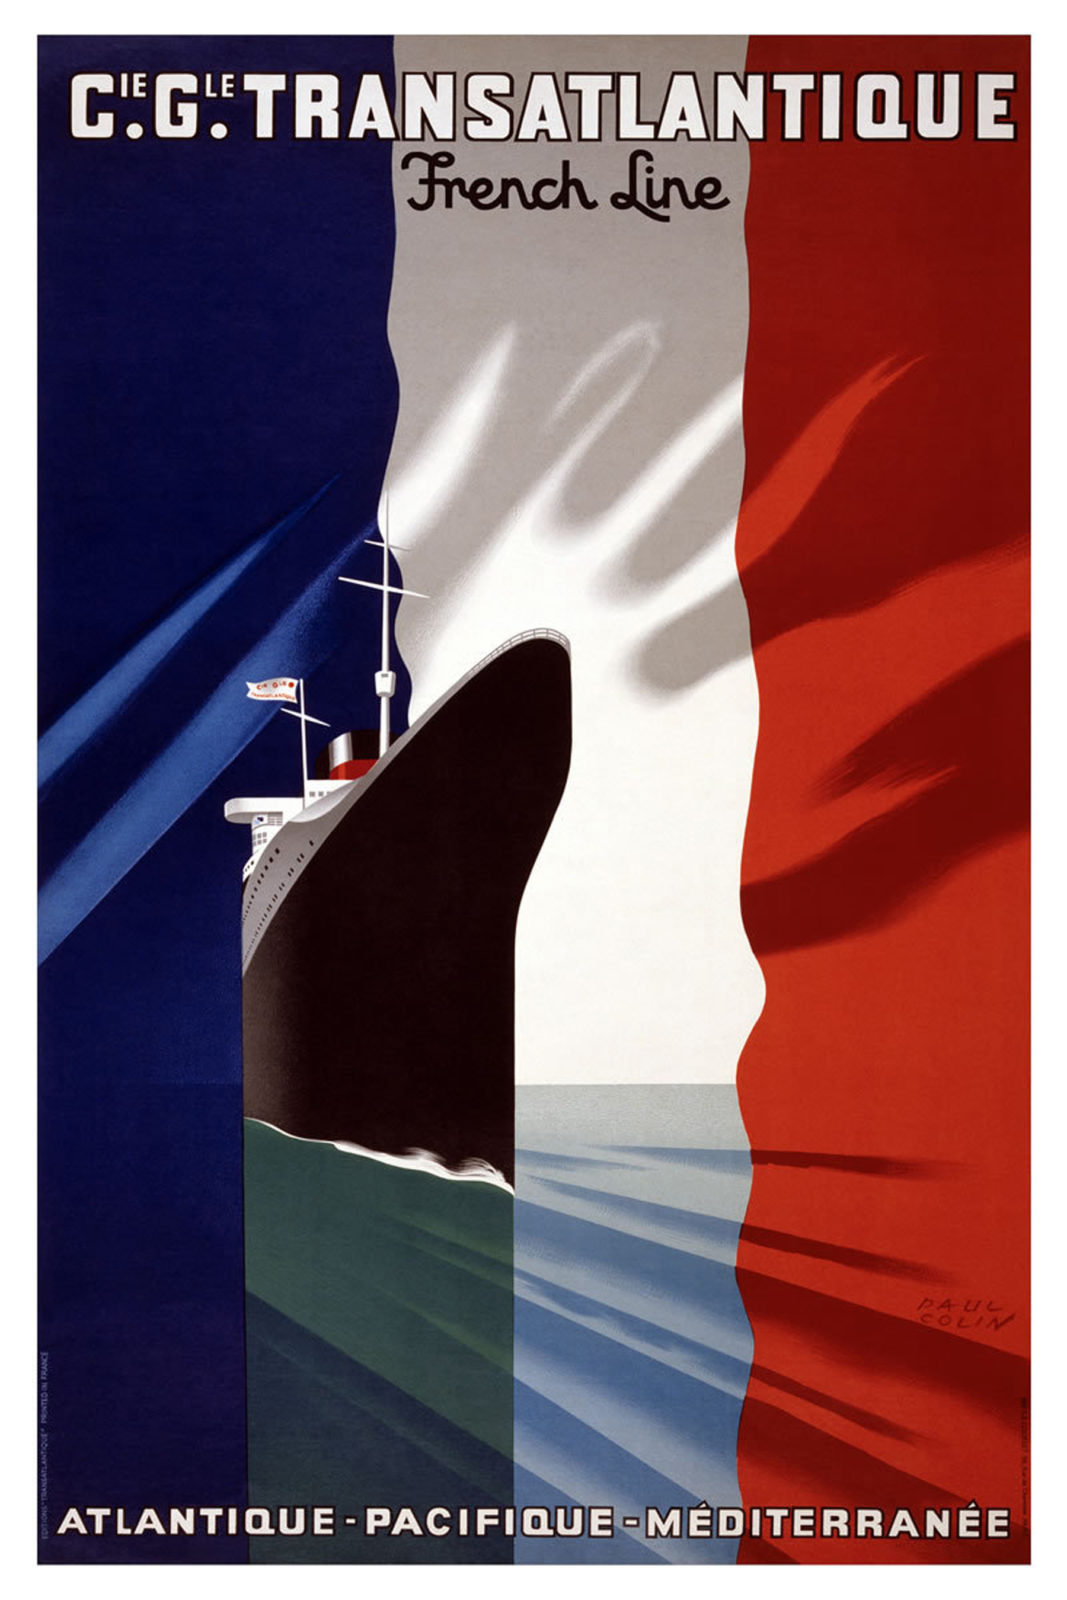 G.G. Transatlatique. Vintage Travel Poster.